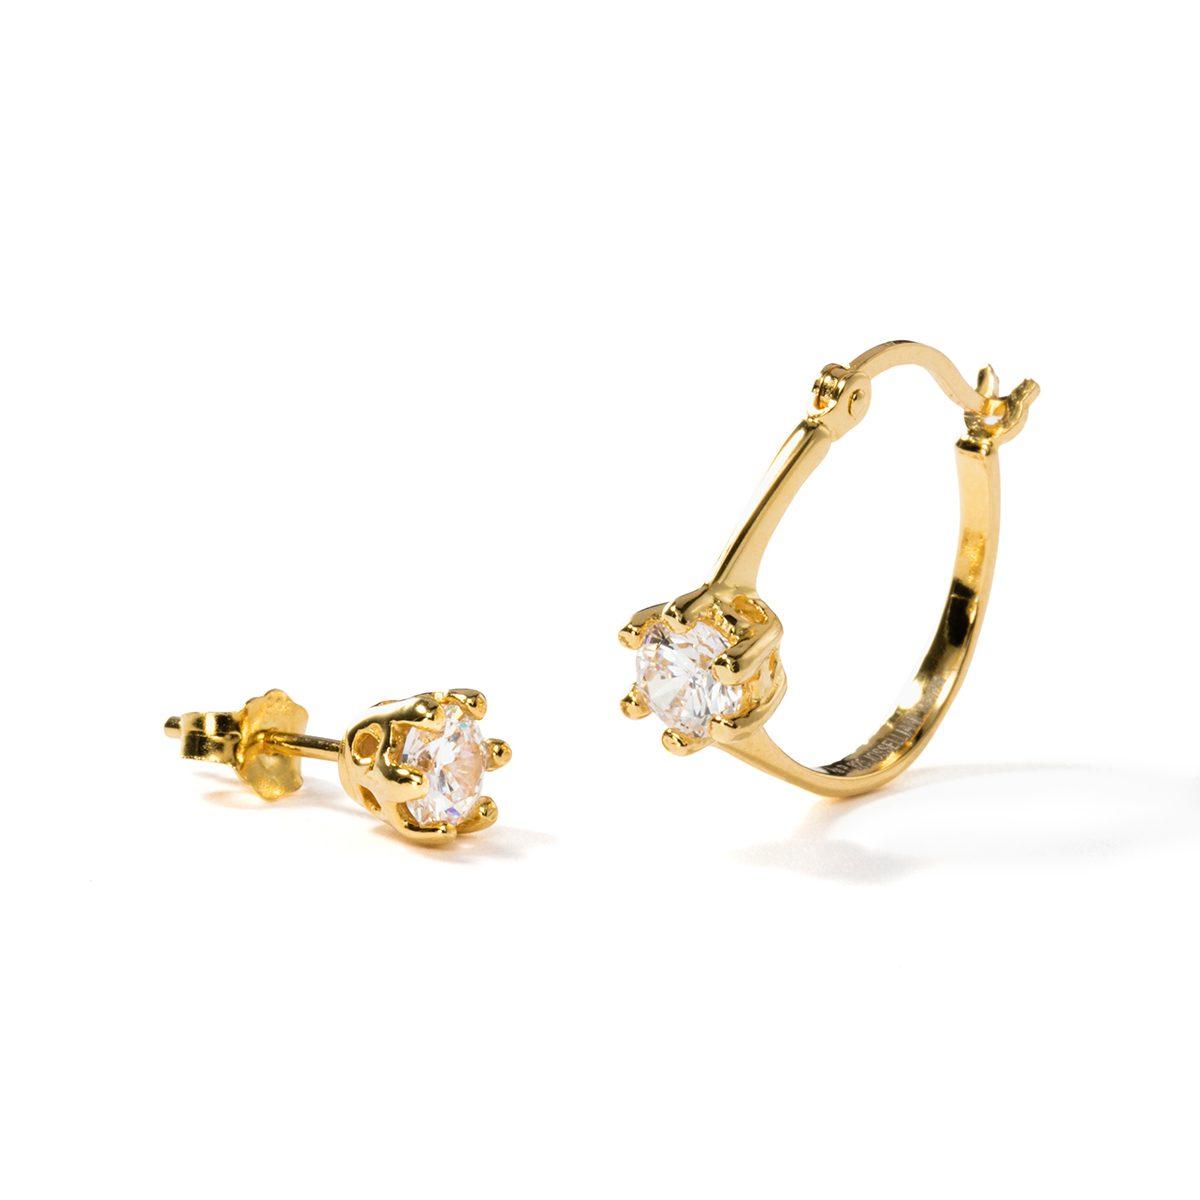 IOSSELLIANI - Classic Collection|Earrings